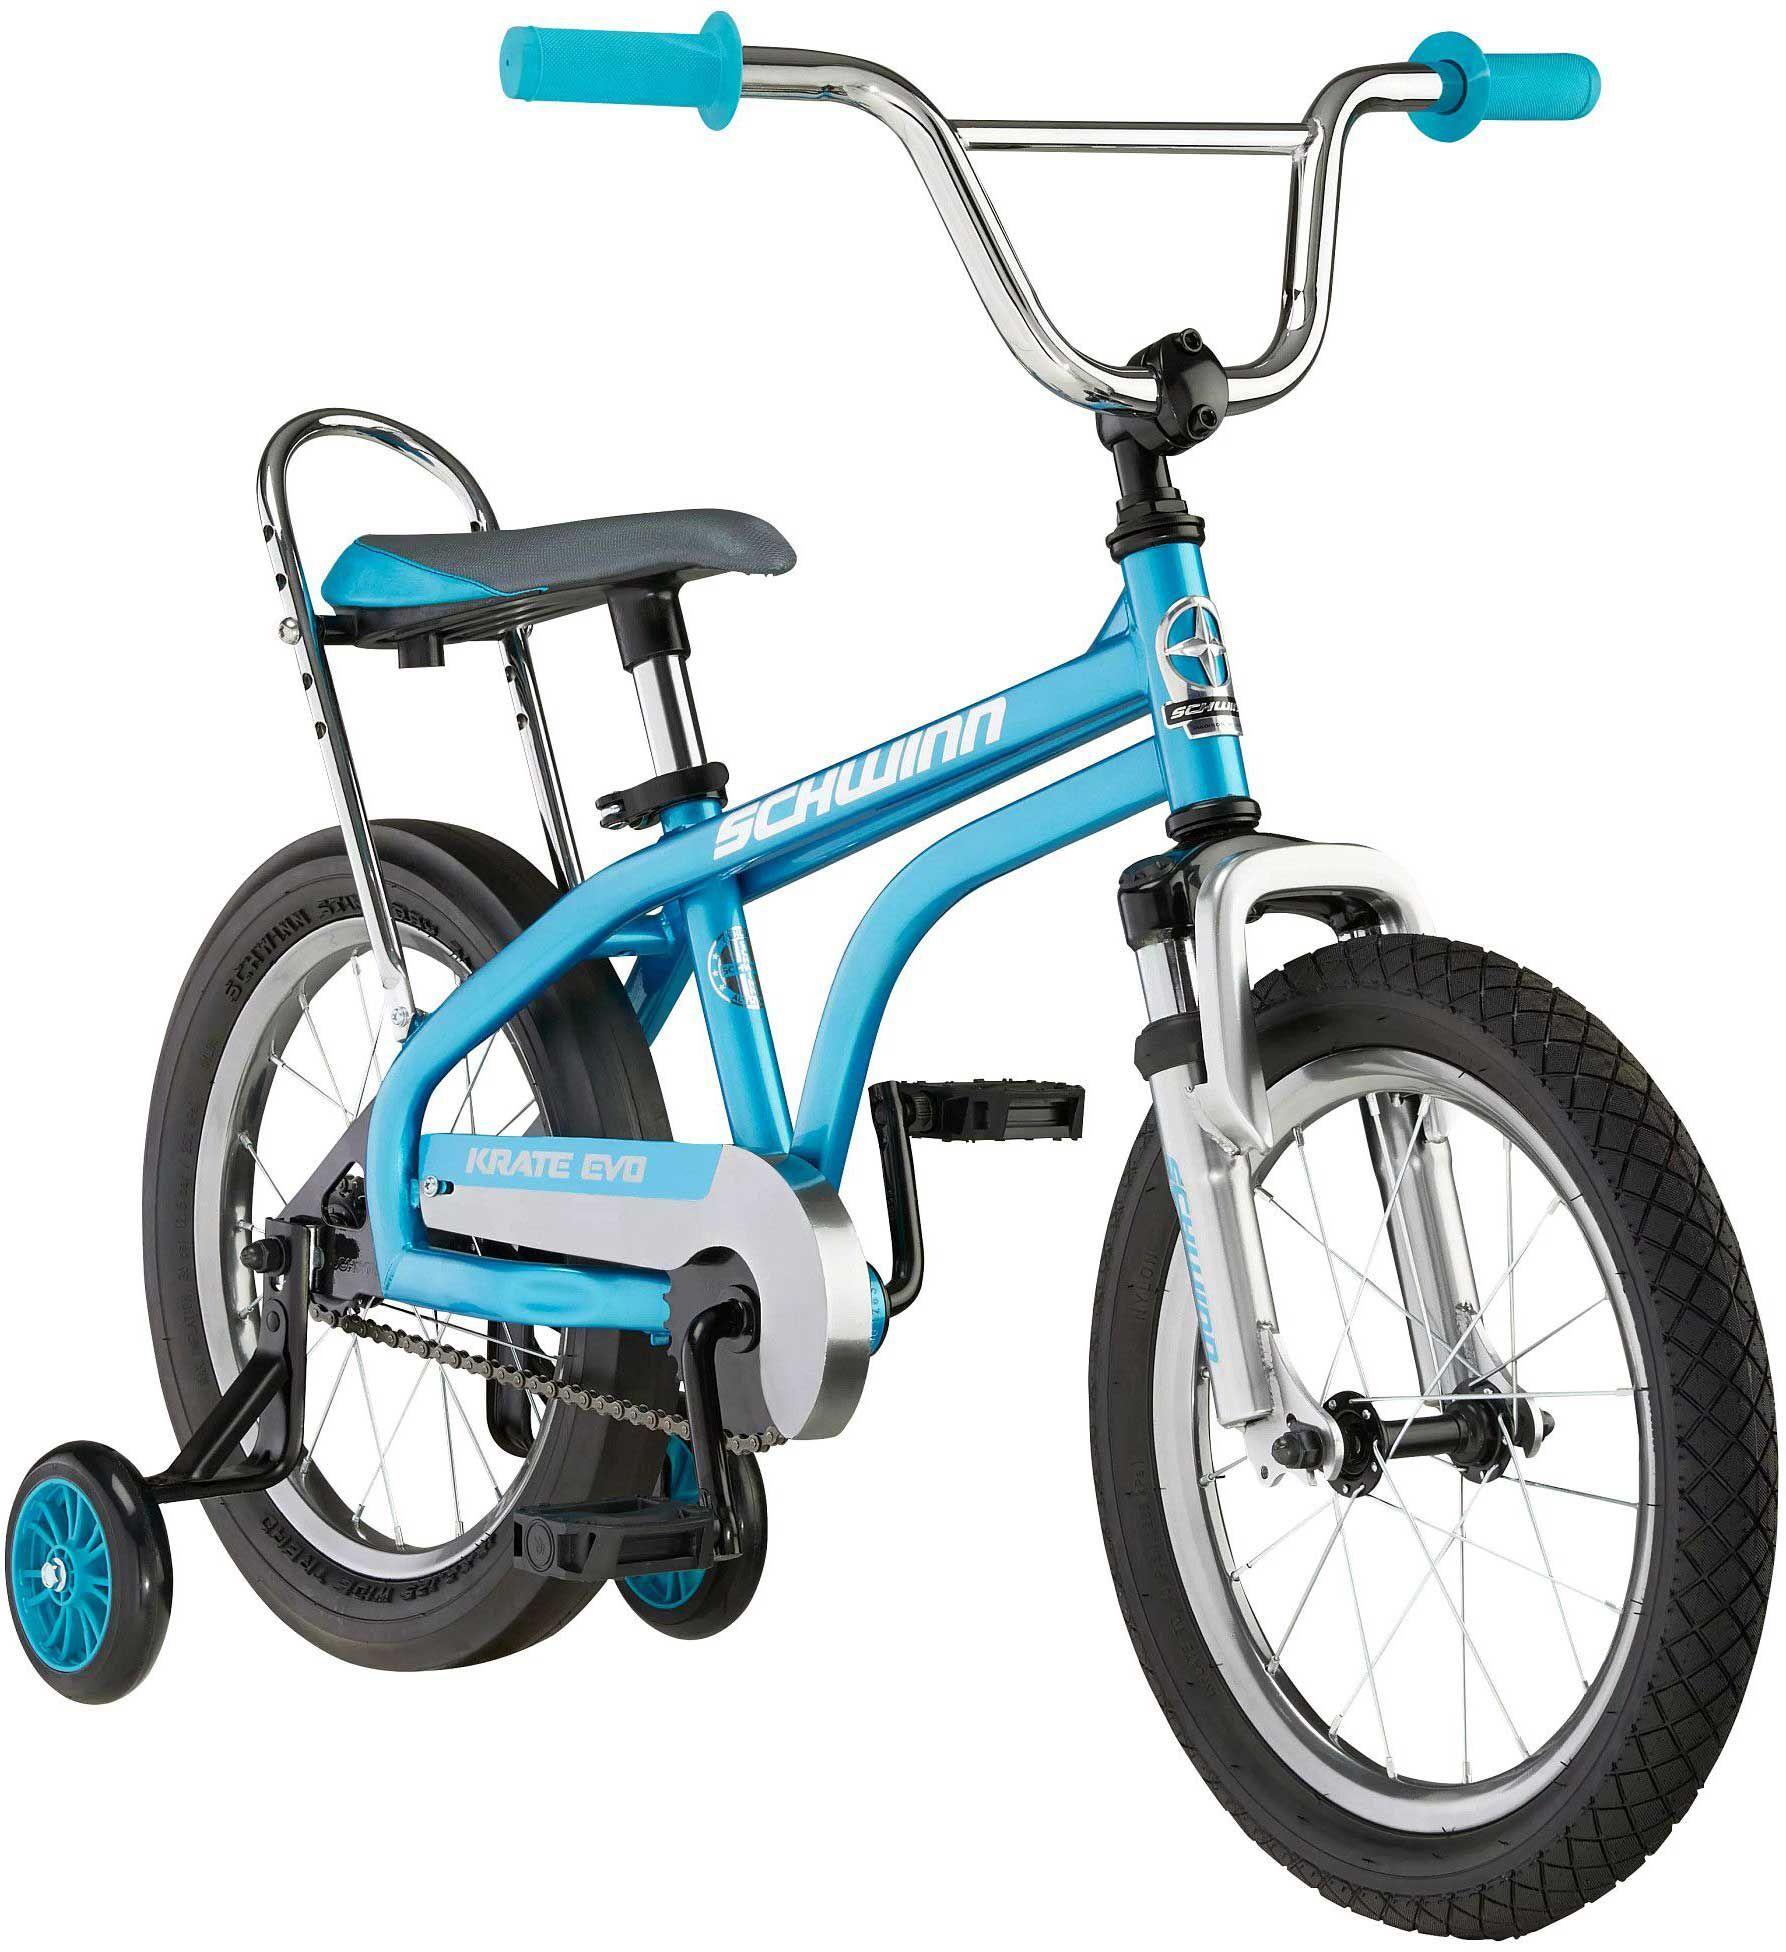 "Schwinn Youth 16"" Krate EVO Bike, 16 IN., Blue"